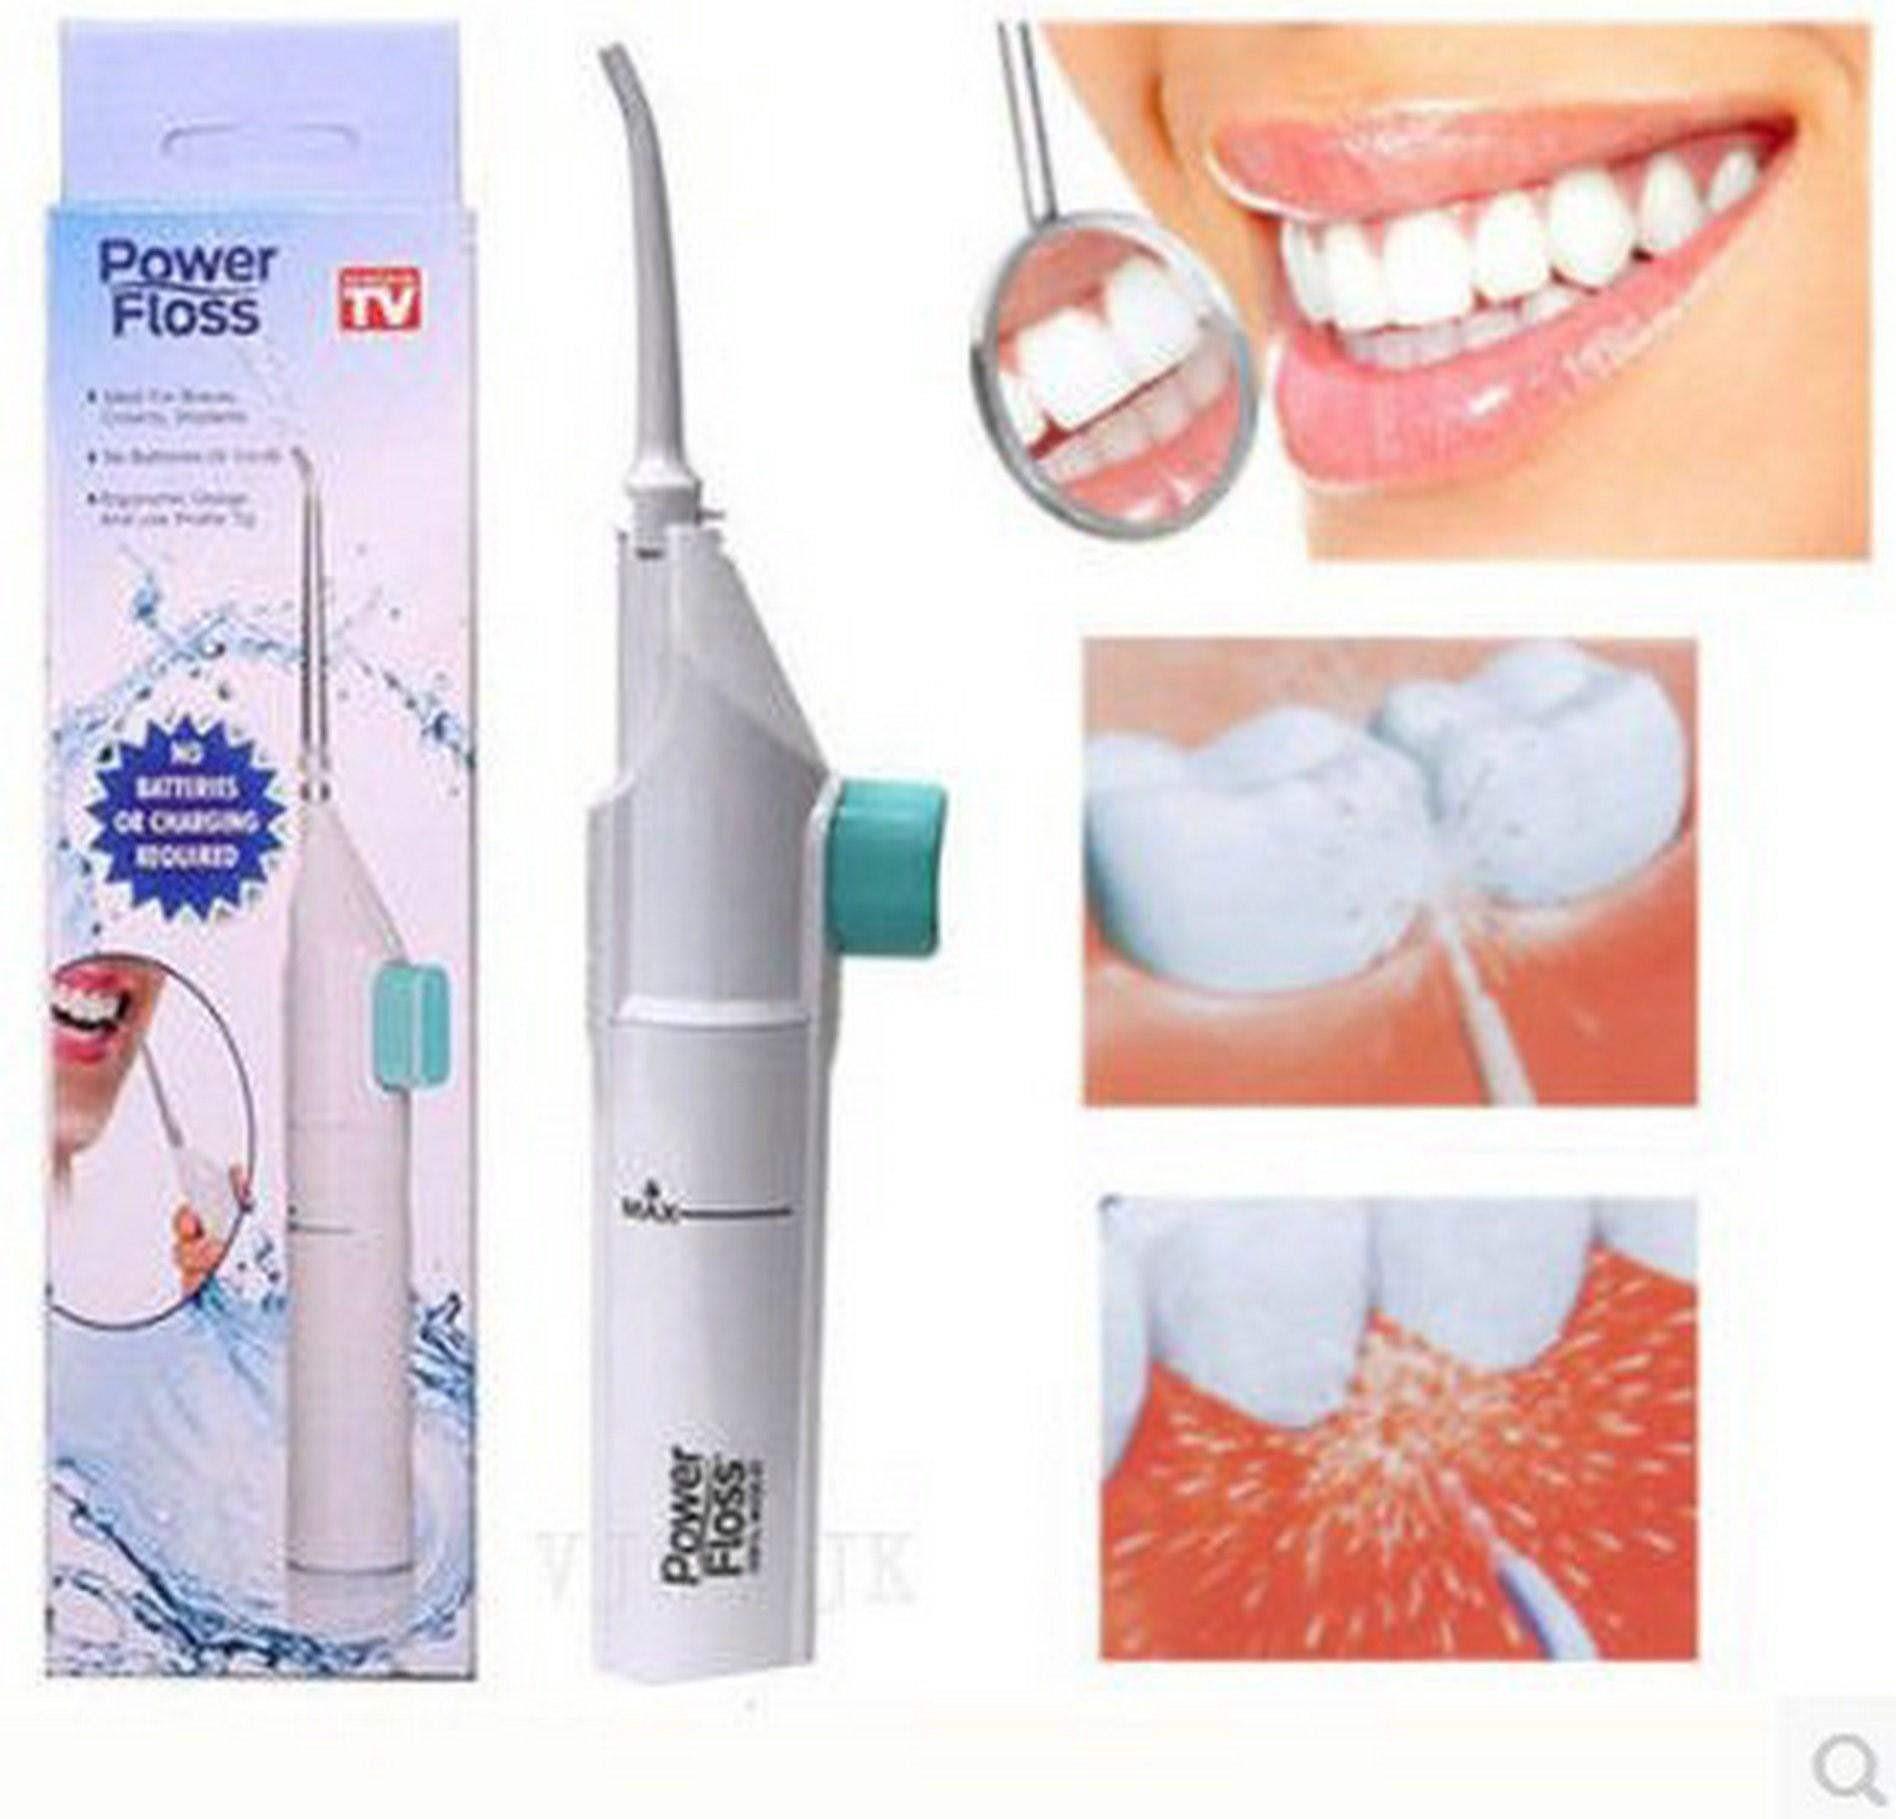 Power Floss冲牙器便携式洁牙器洗牙器口腔牙线冲洗清洁牙齿水